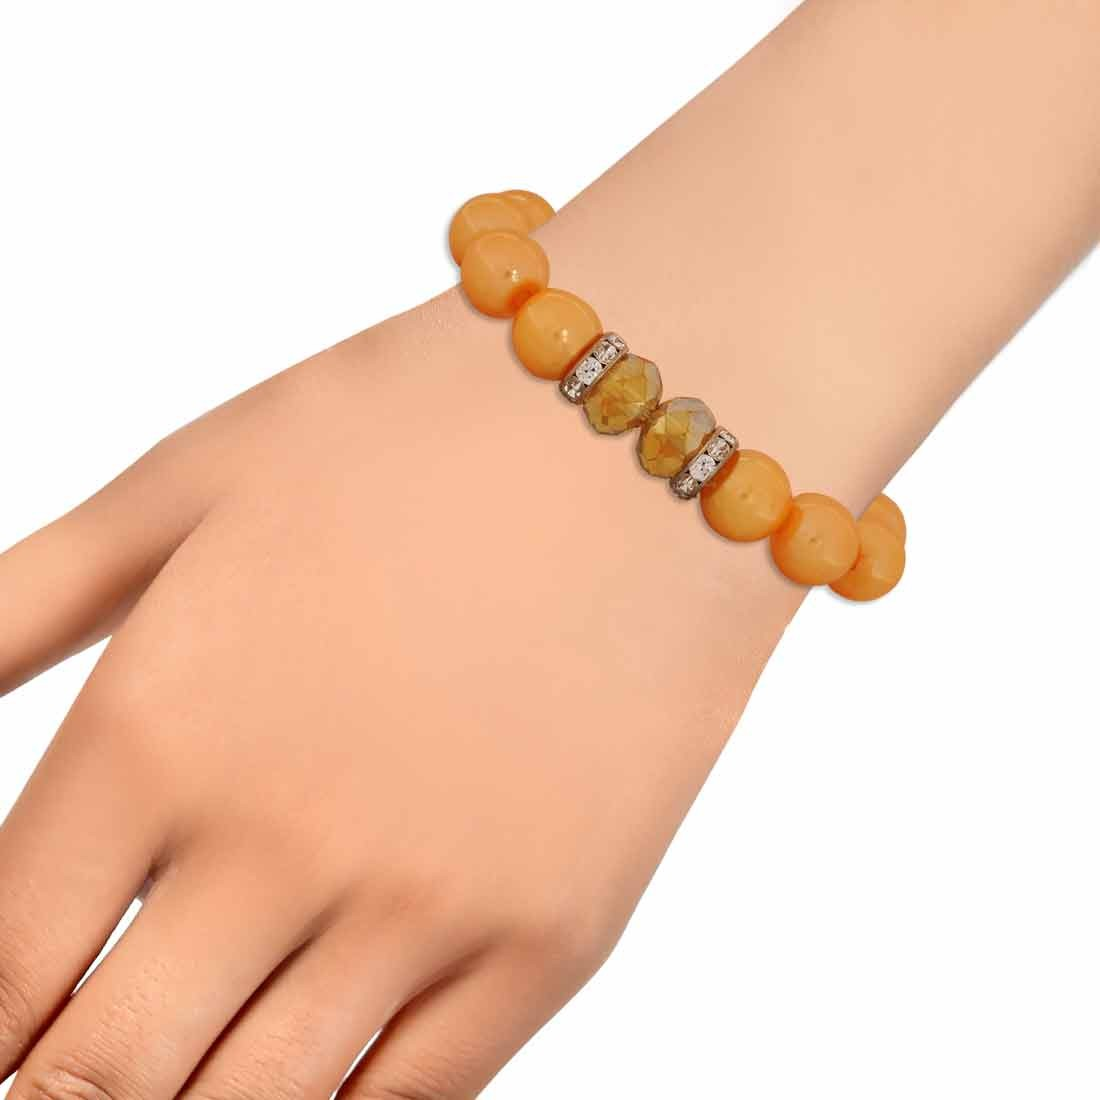 Classy Yellow Contemporary Adjustable Reunion Size Bracelet Alloy Maayra MY6817